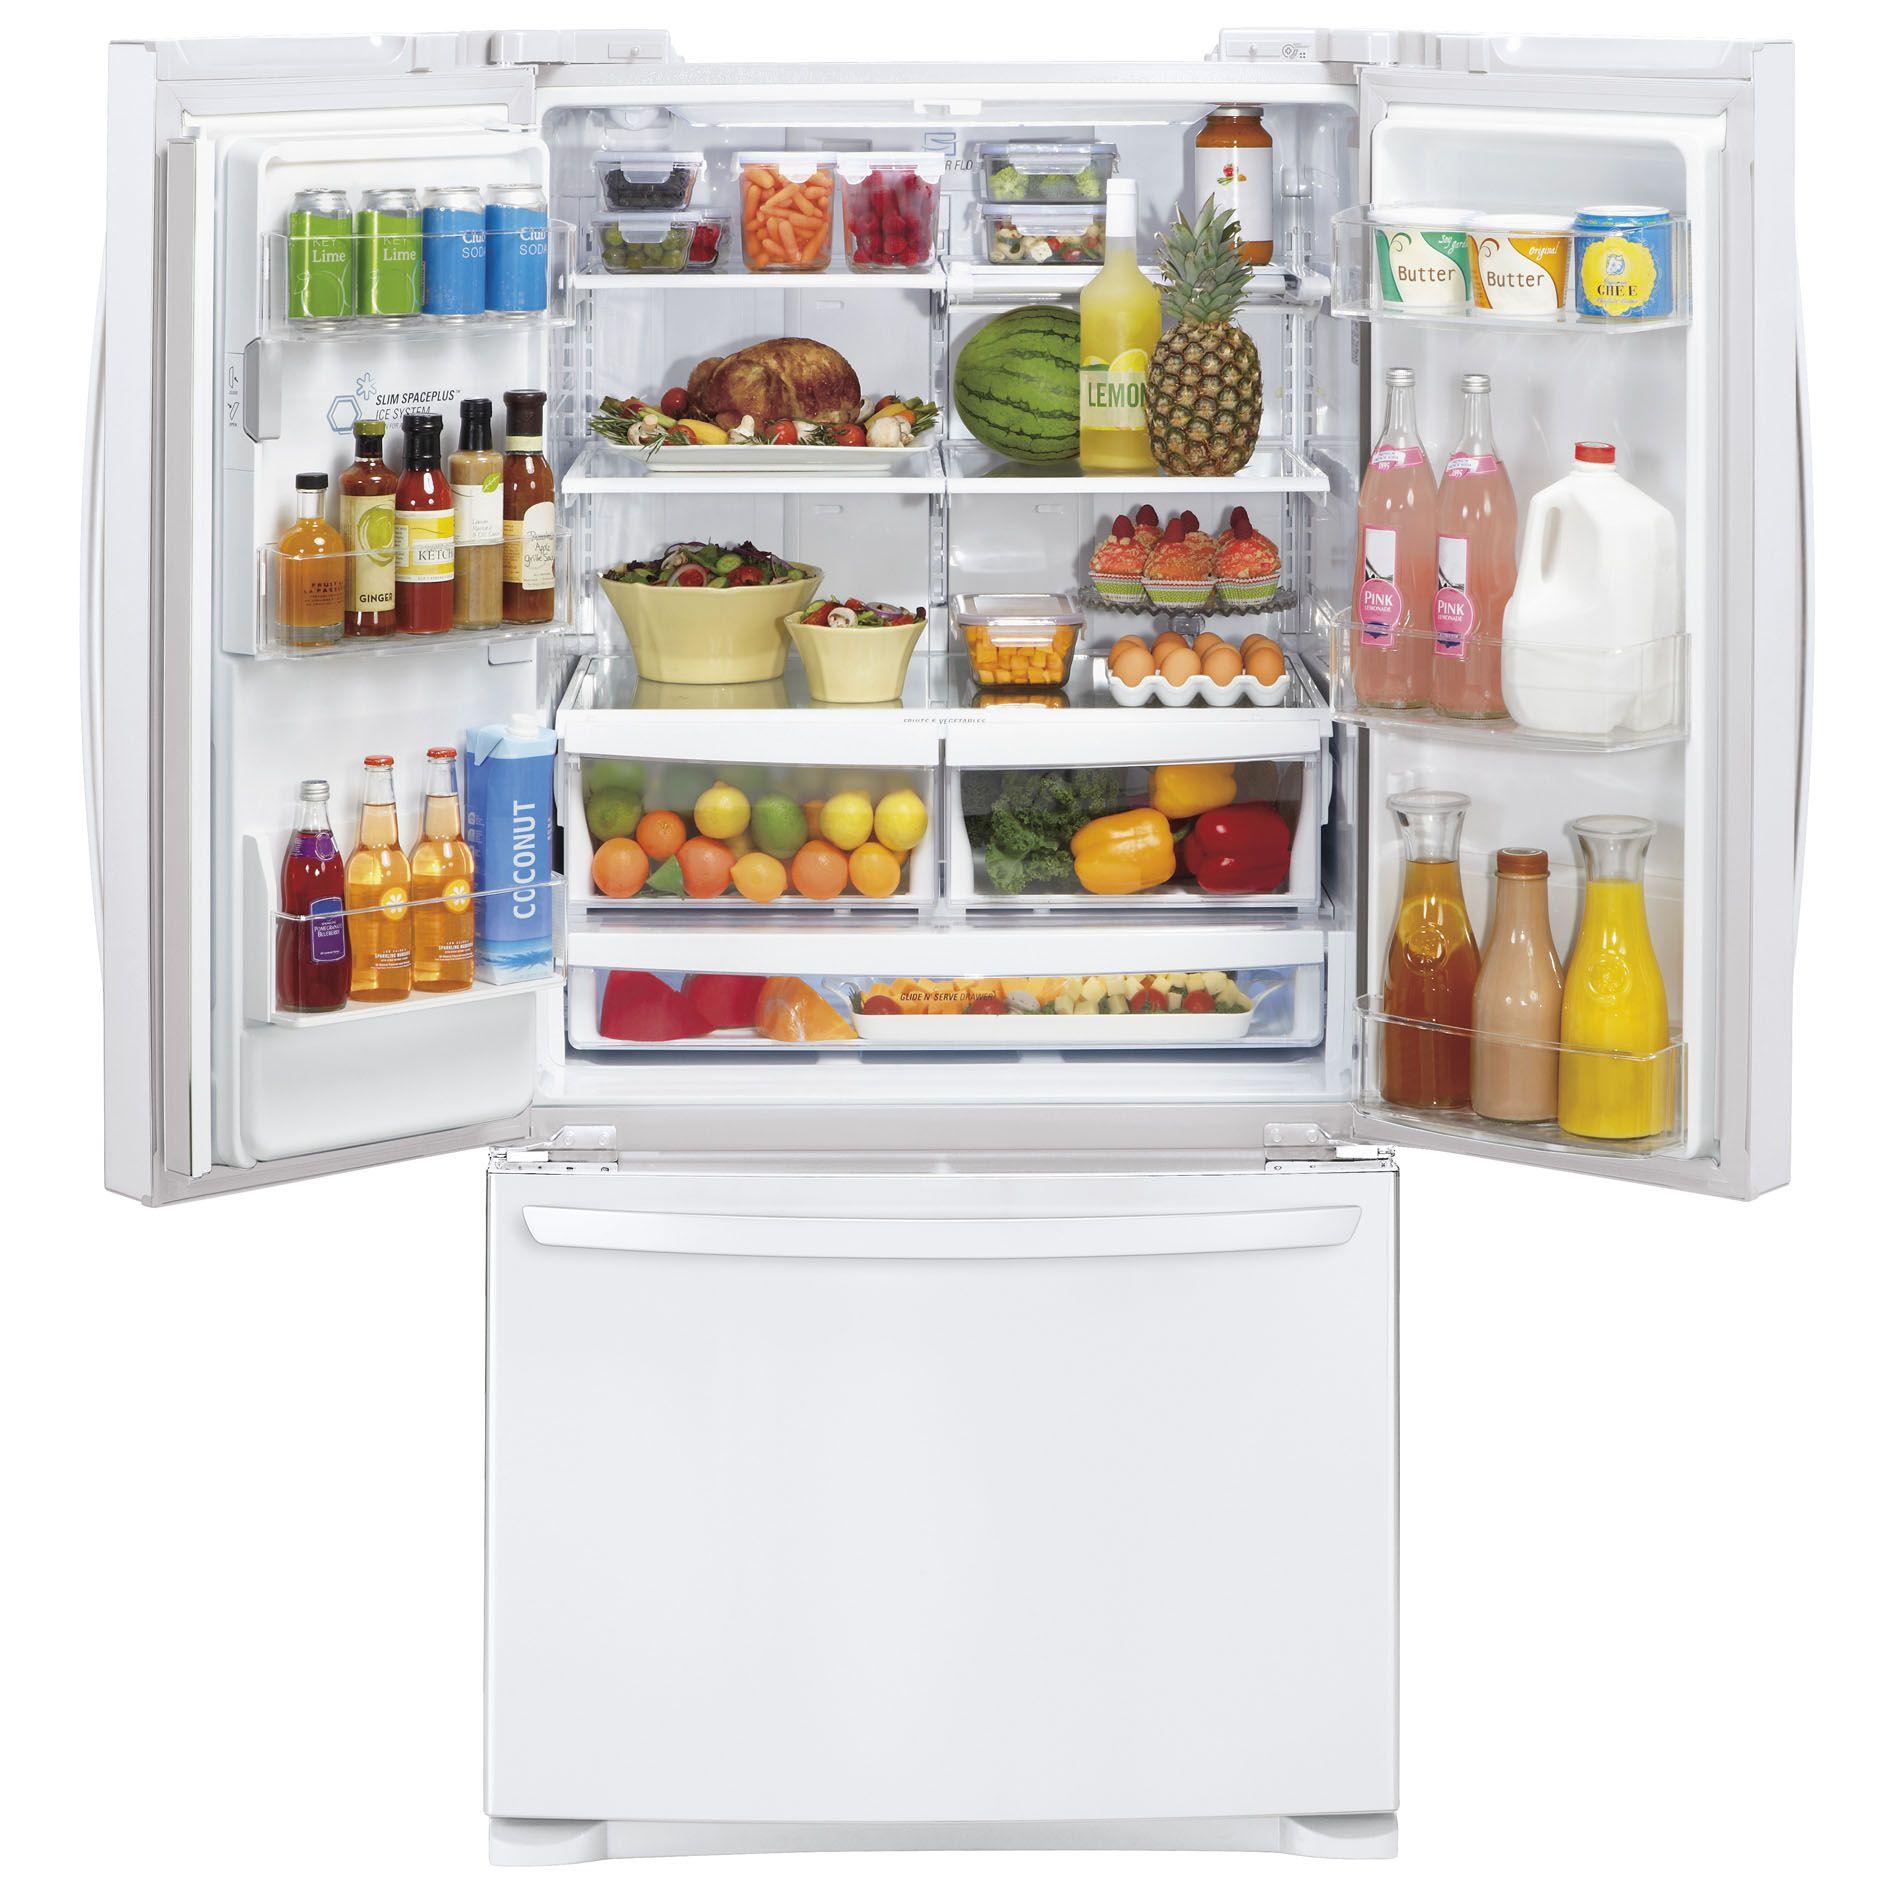 LG 27 cu. ft.  French Door Bottom-Freezer Refrigerator - White